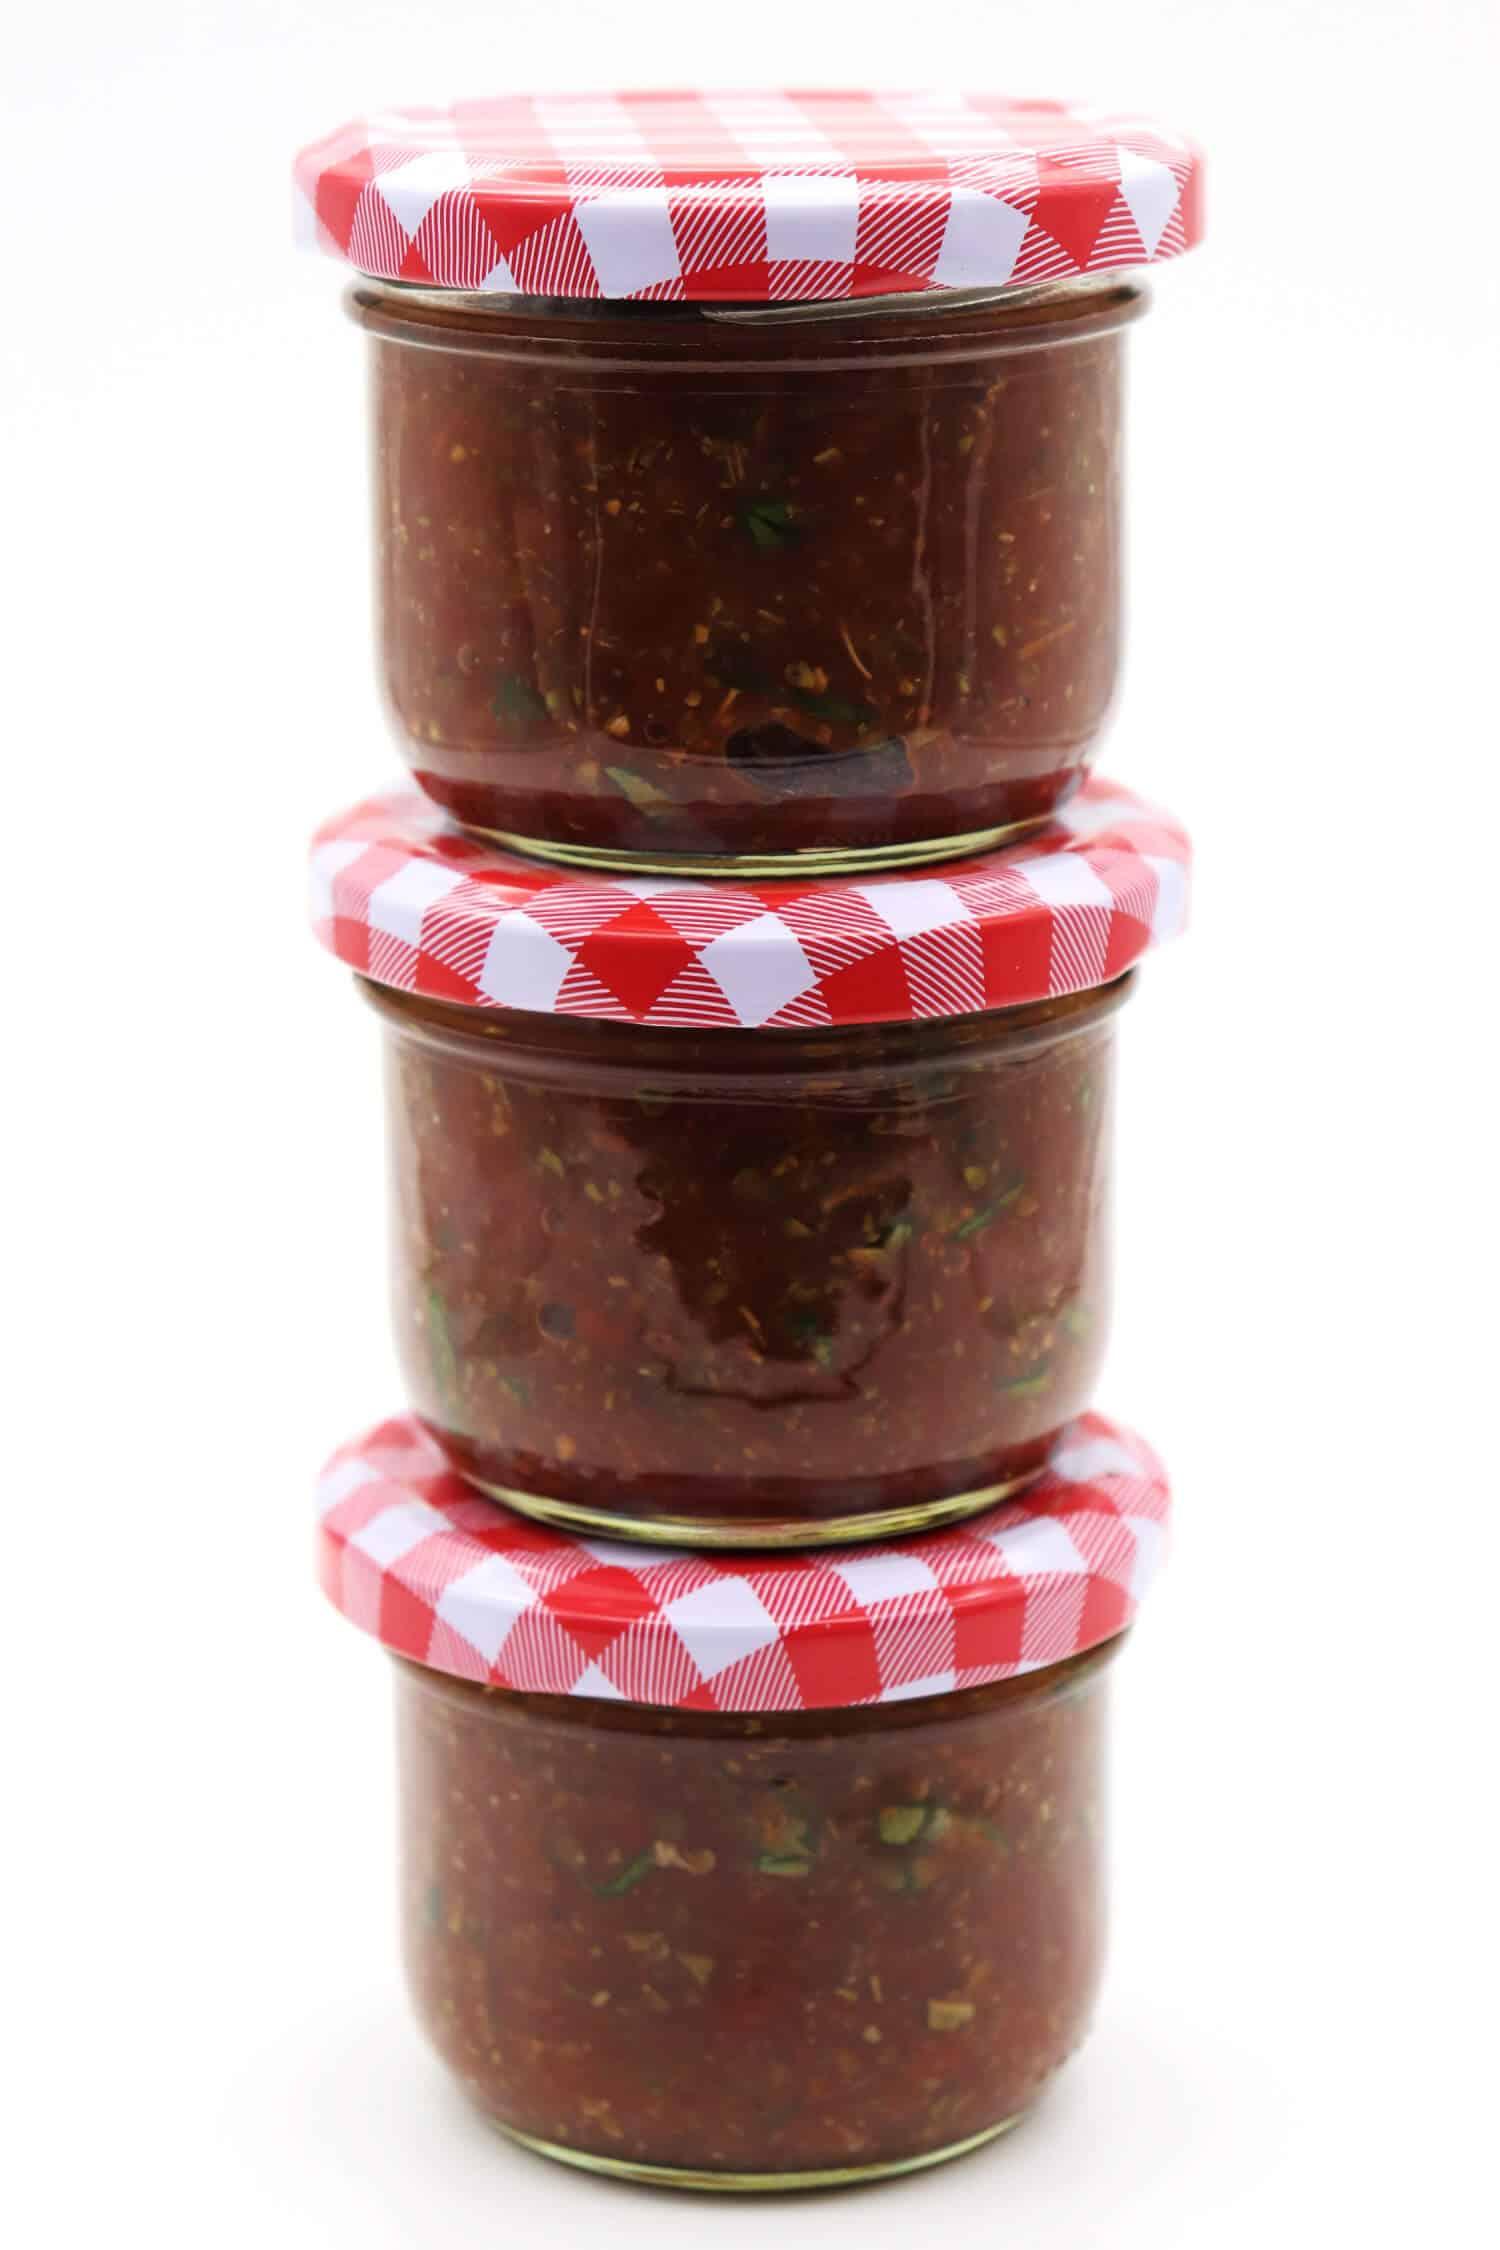 Rezept für Low Carb Tomatensoße ohne Zucker